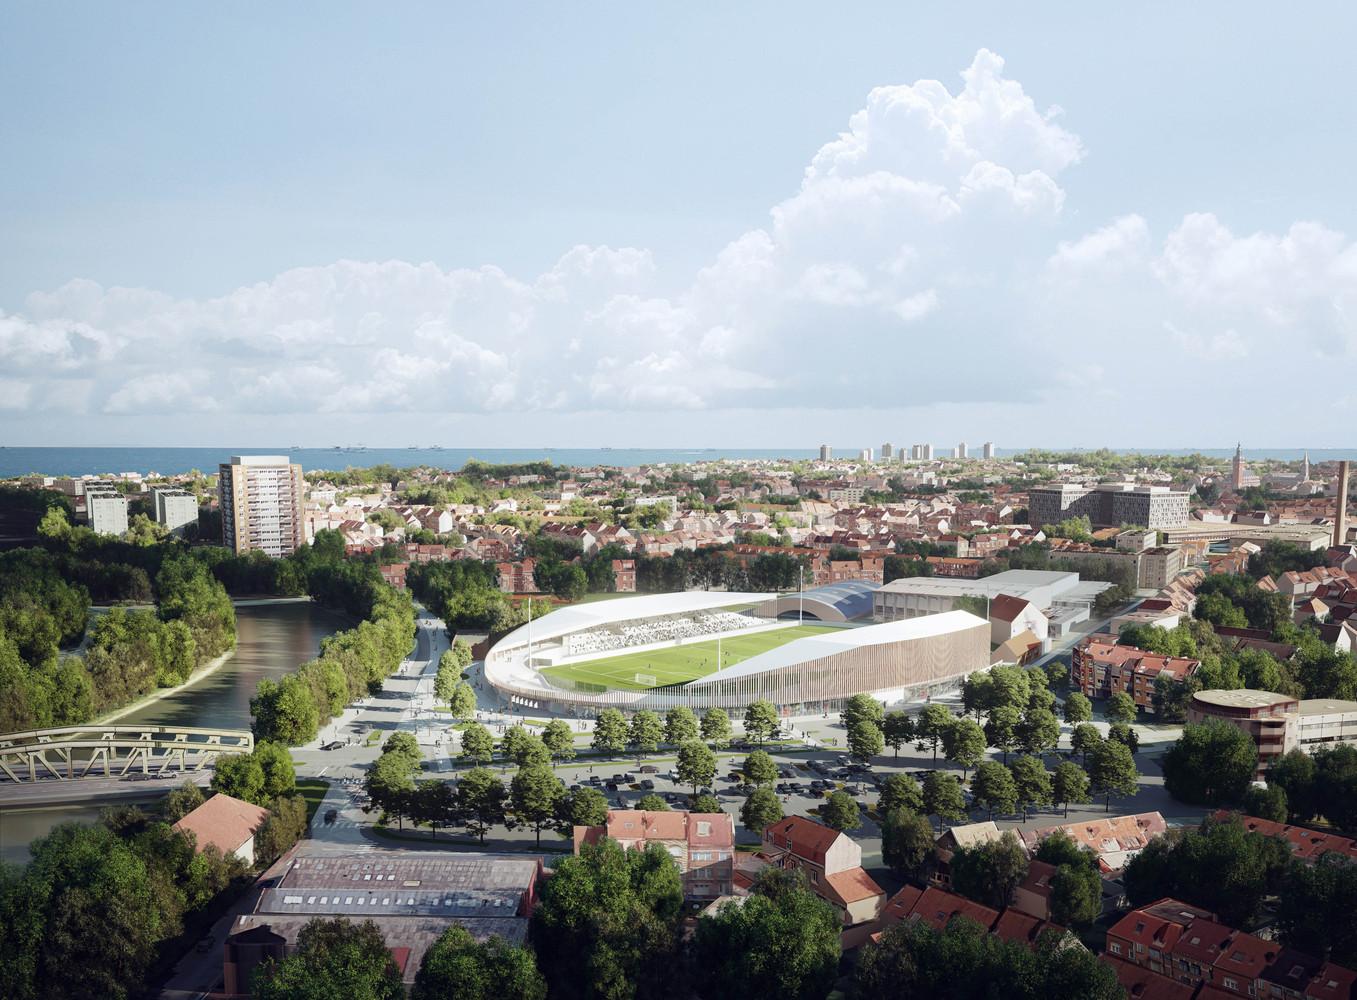 Gallery Of Competition Winning Stadium Design Promotes Inclusivity